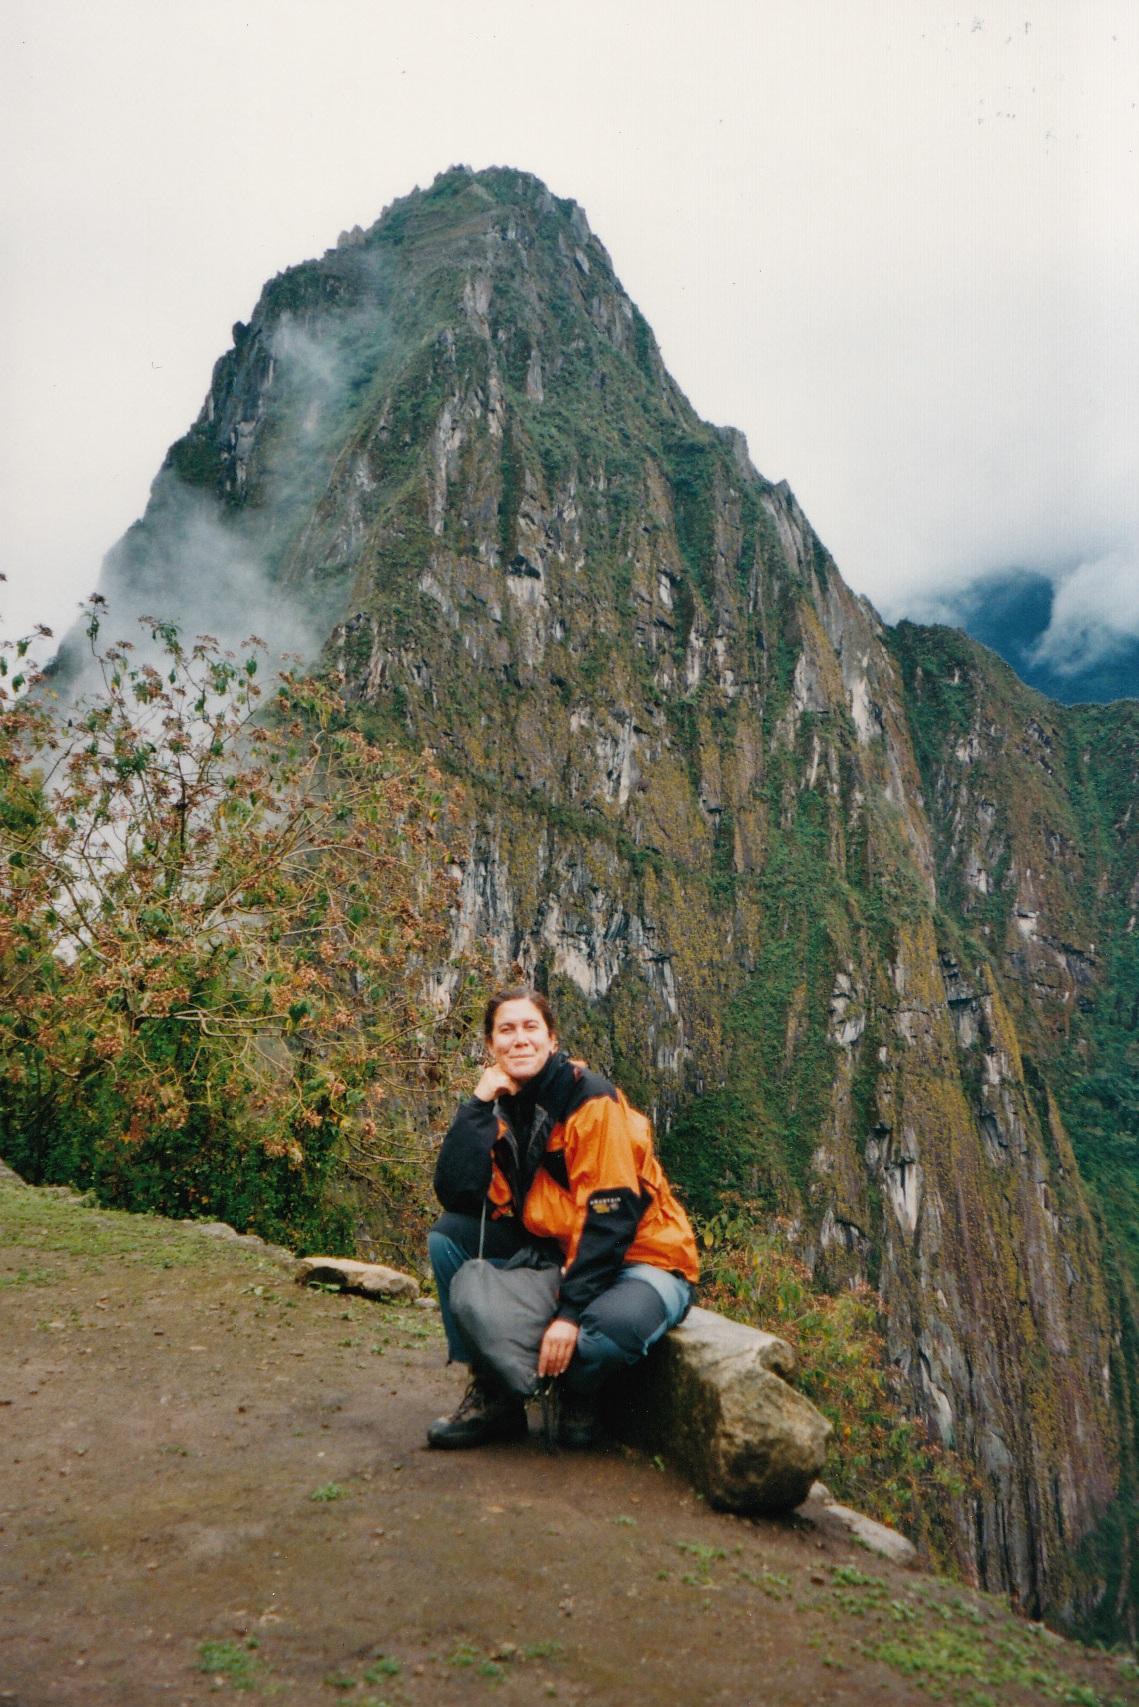 Machu Picchu, mjdunjo.com